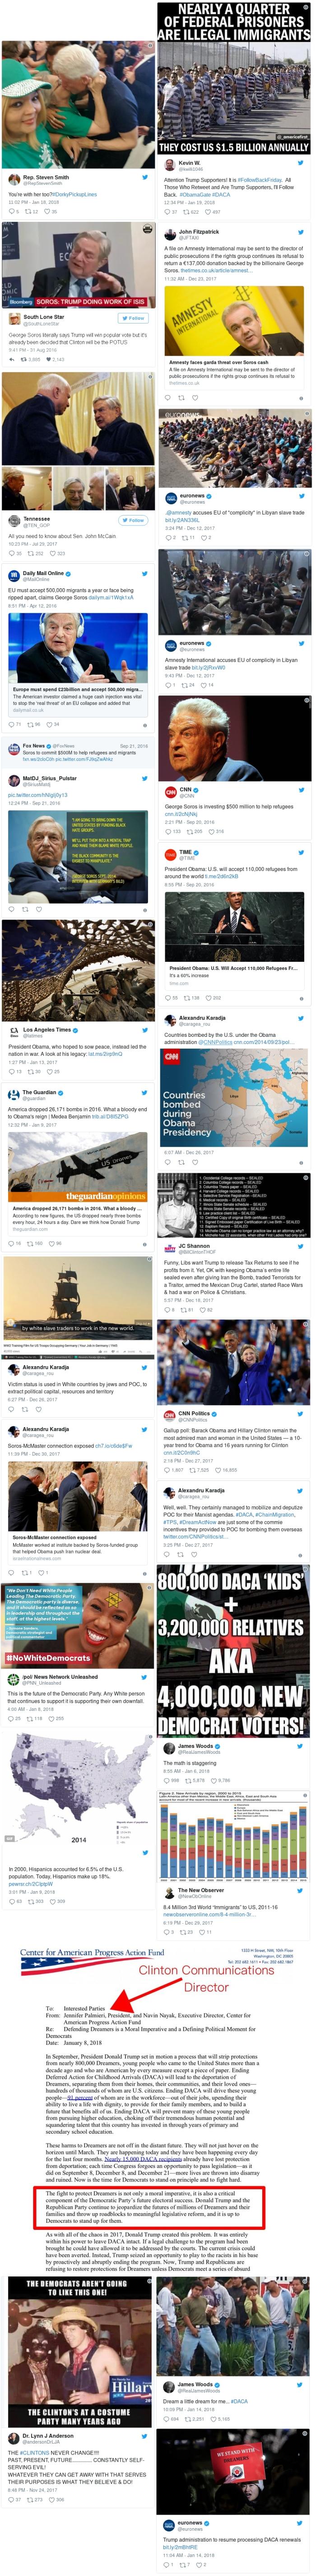 Air crash investigation deadly distraction dailymotion | Air Crash